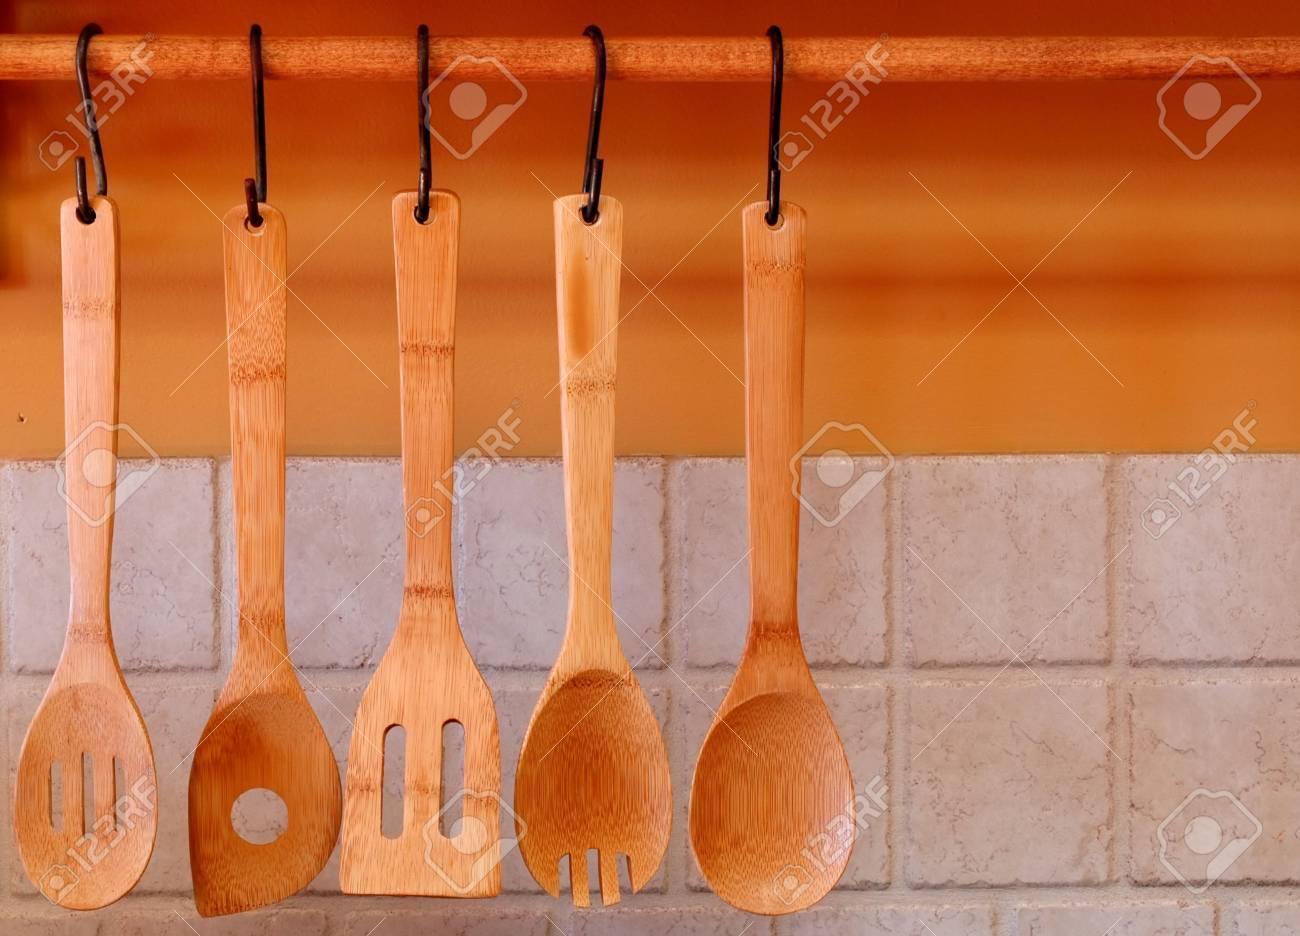 Wood Cooking Utensils - 595935